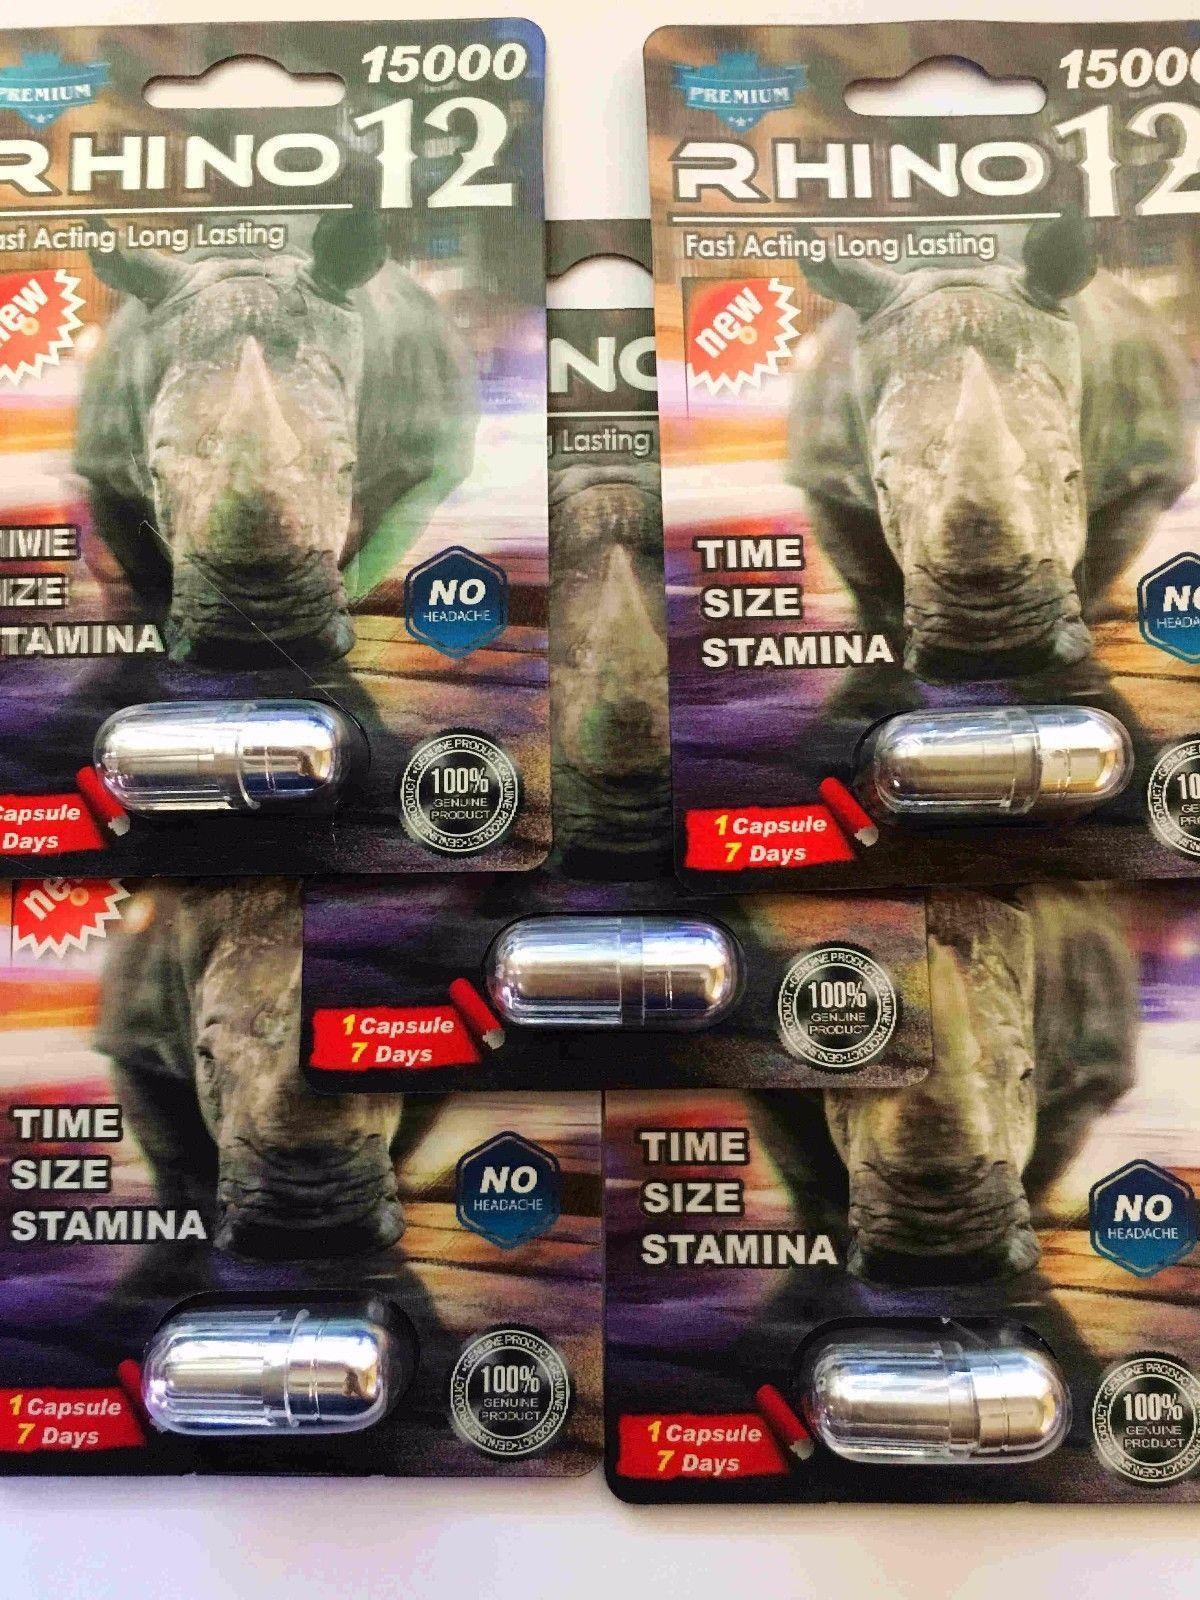 100% Genuine Rhino 12 Premium 15000 Male Sexual Performance Enhancer image 2